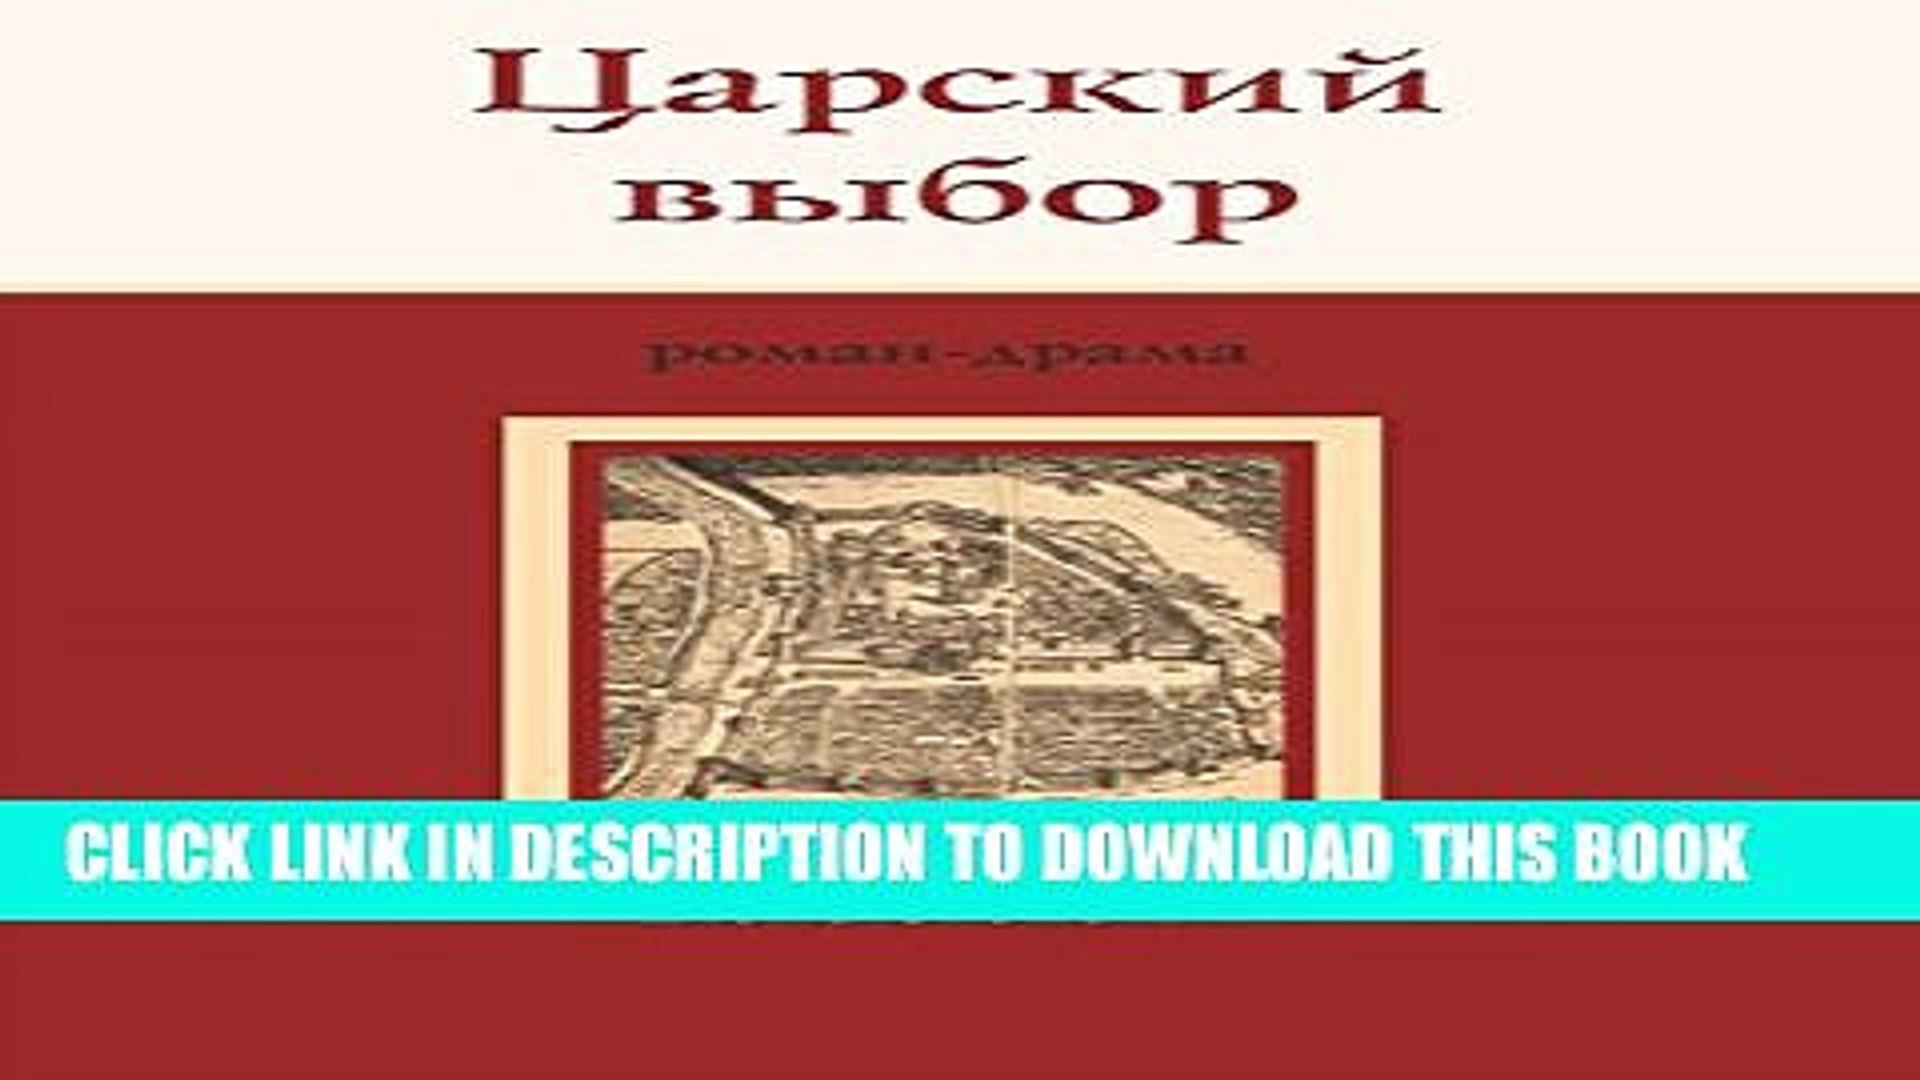 [PDF] Цар�кий выбор : и�ториче�кий роман-драма (Russian Edition)